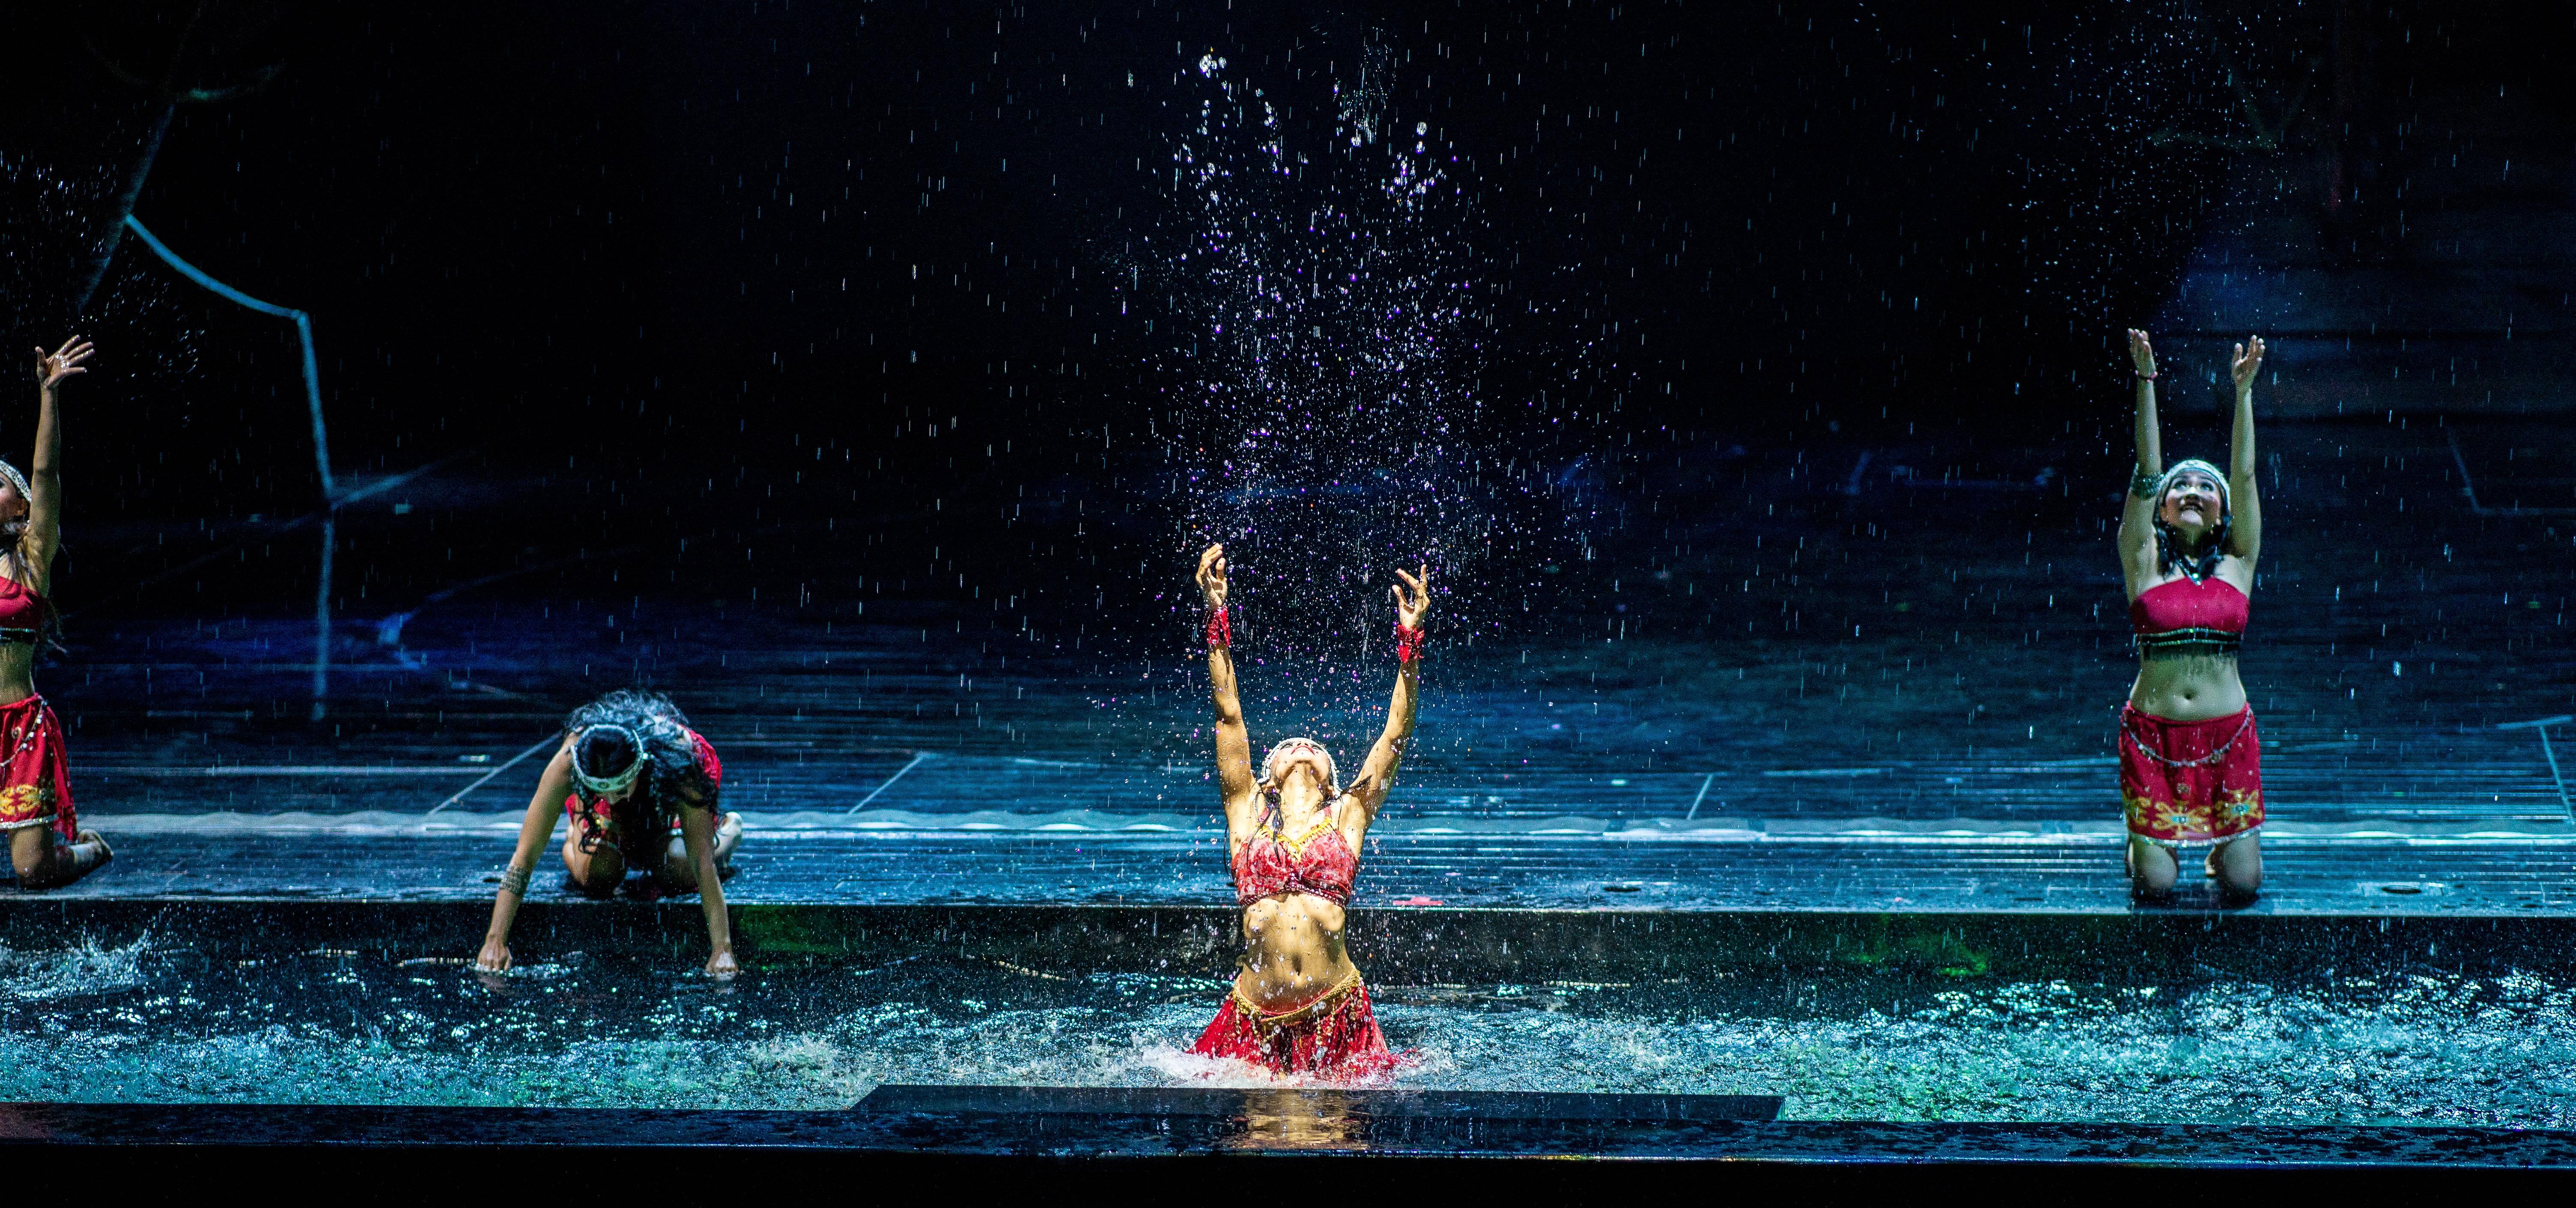 Devdan Show Bali Indonesia Album Imgur Water Dance Visited Kab